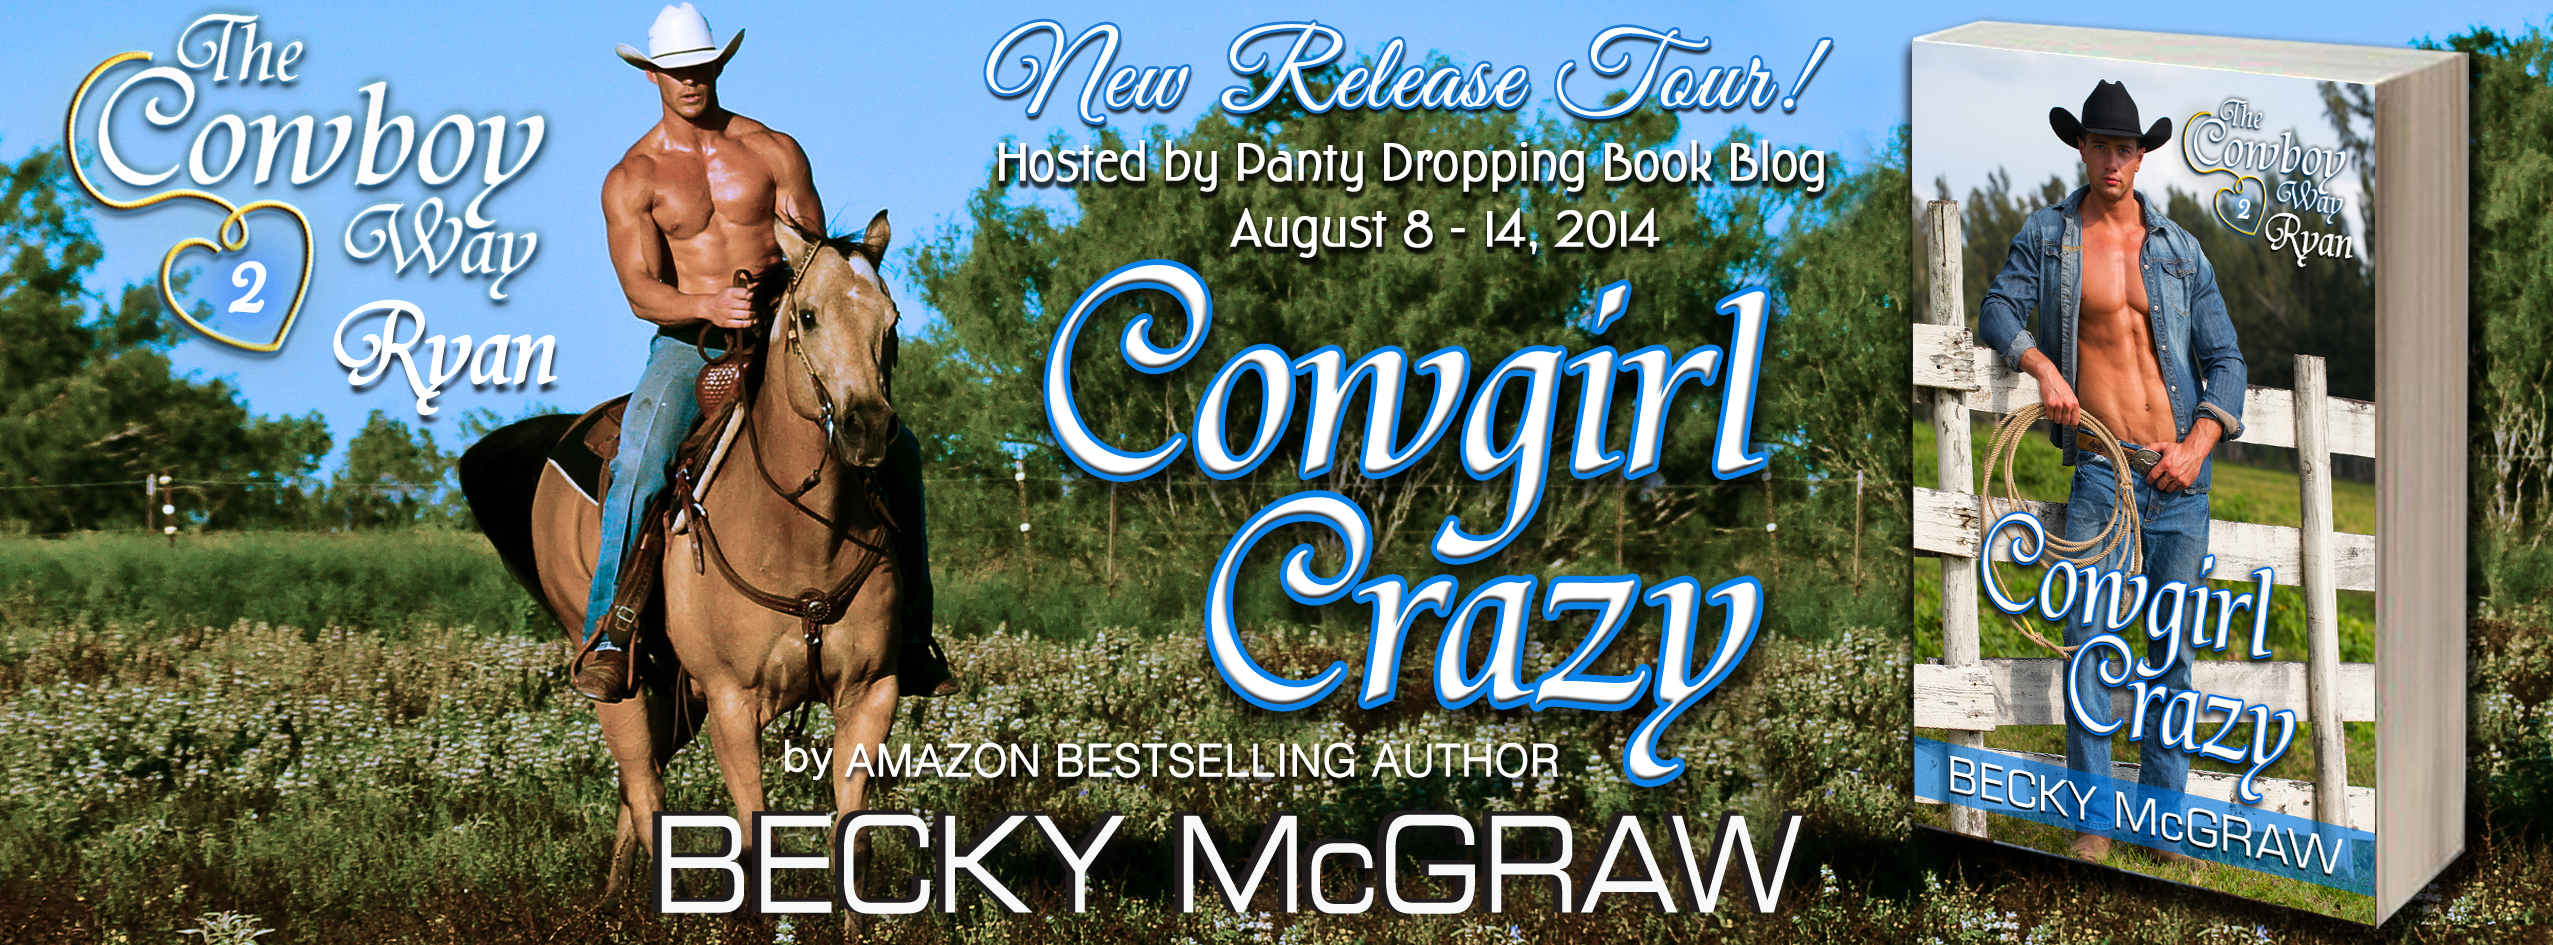 cowgirl-crazy-FB-newrelease-header2